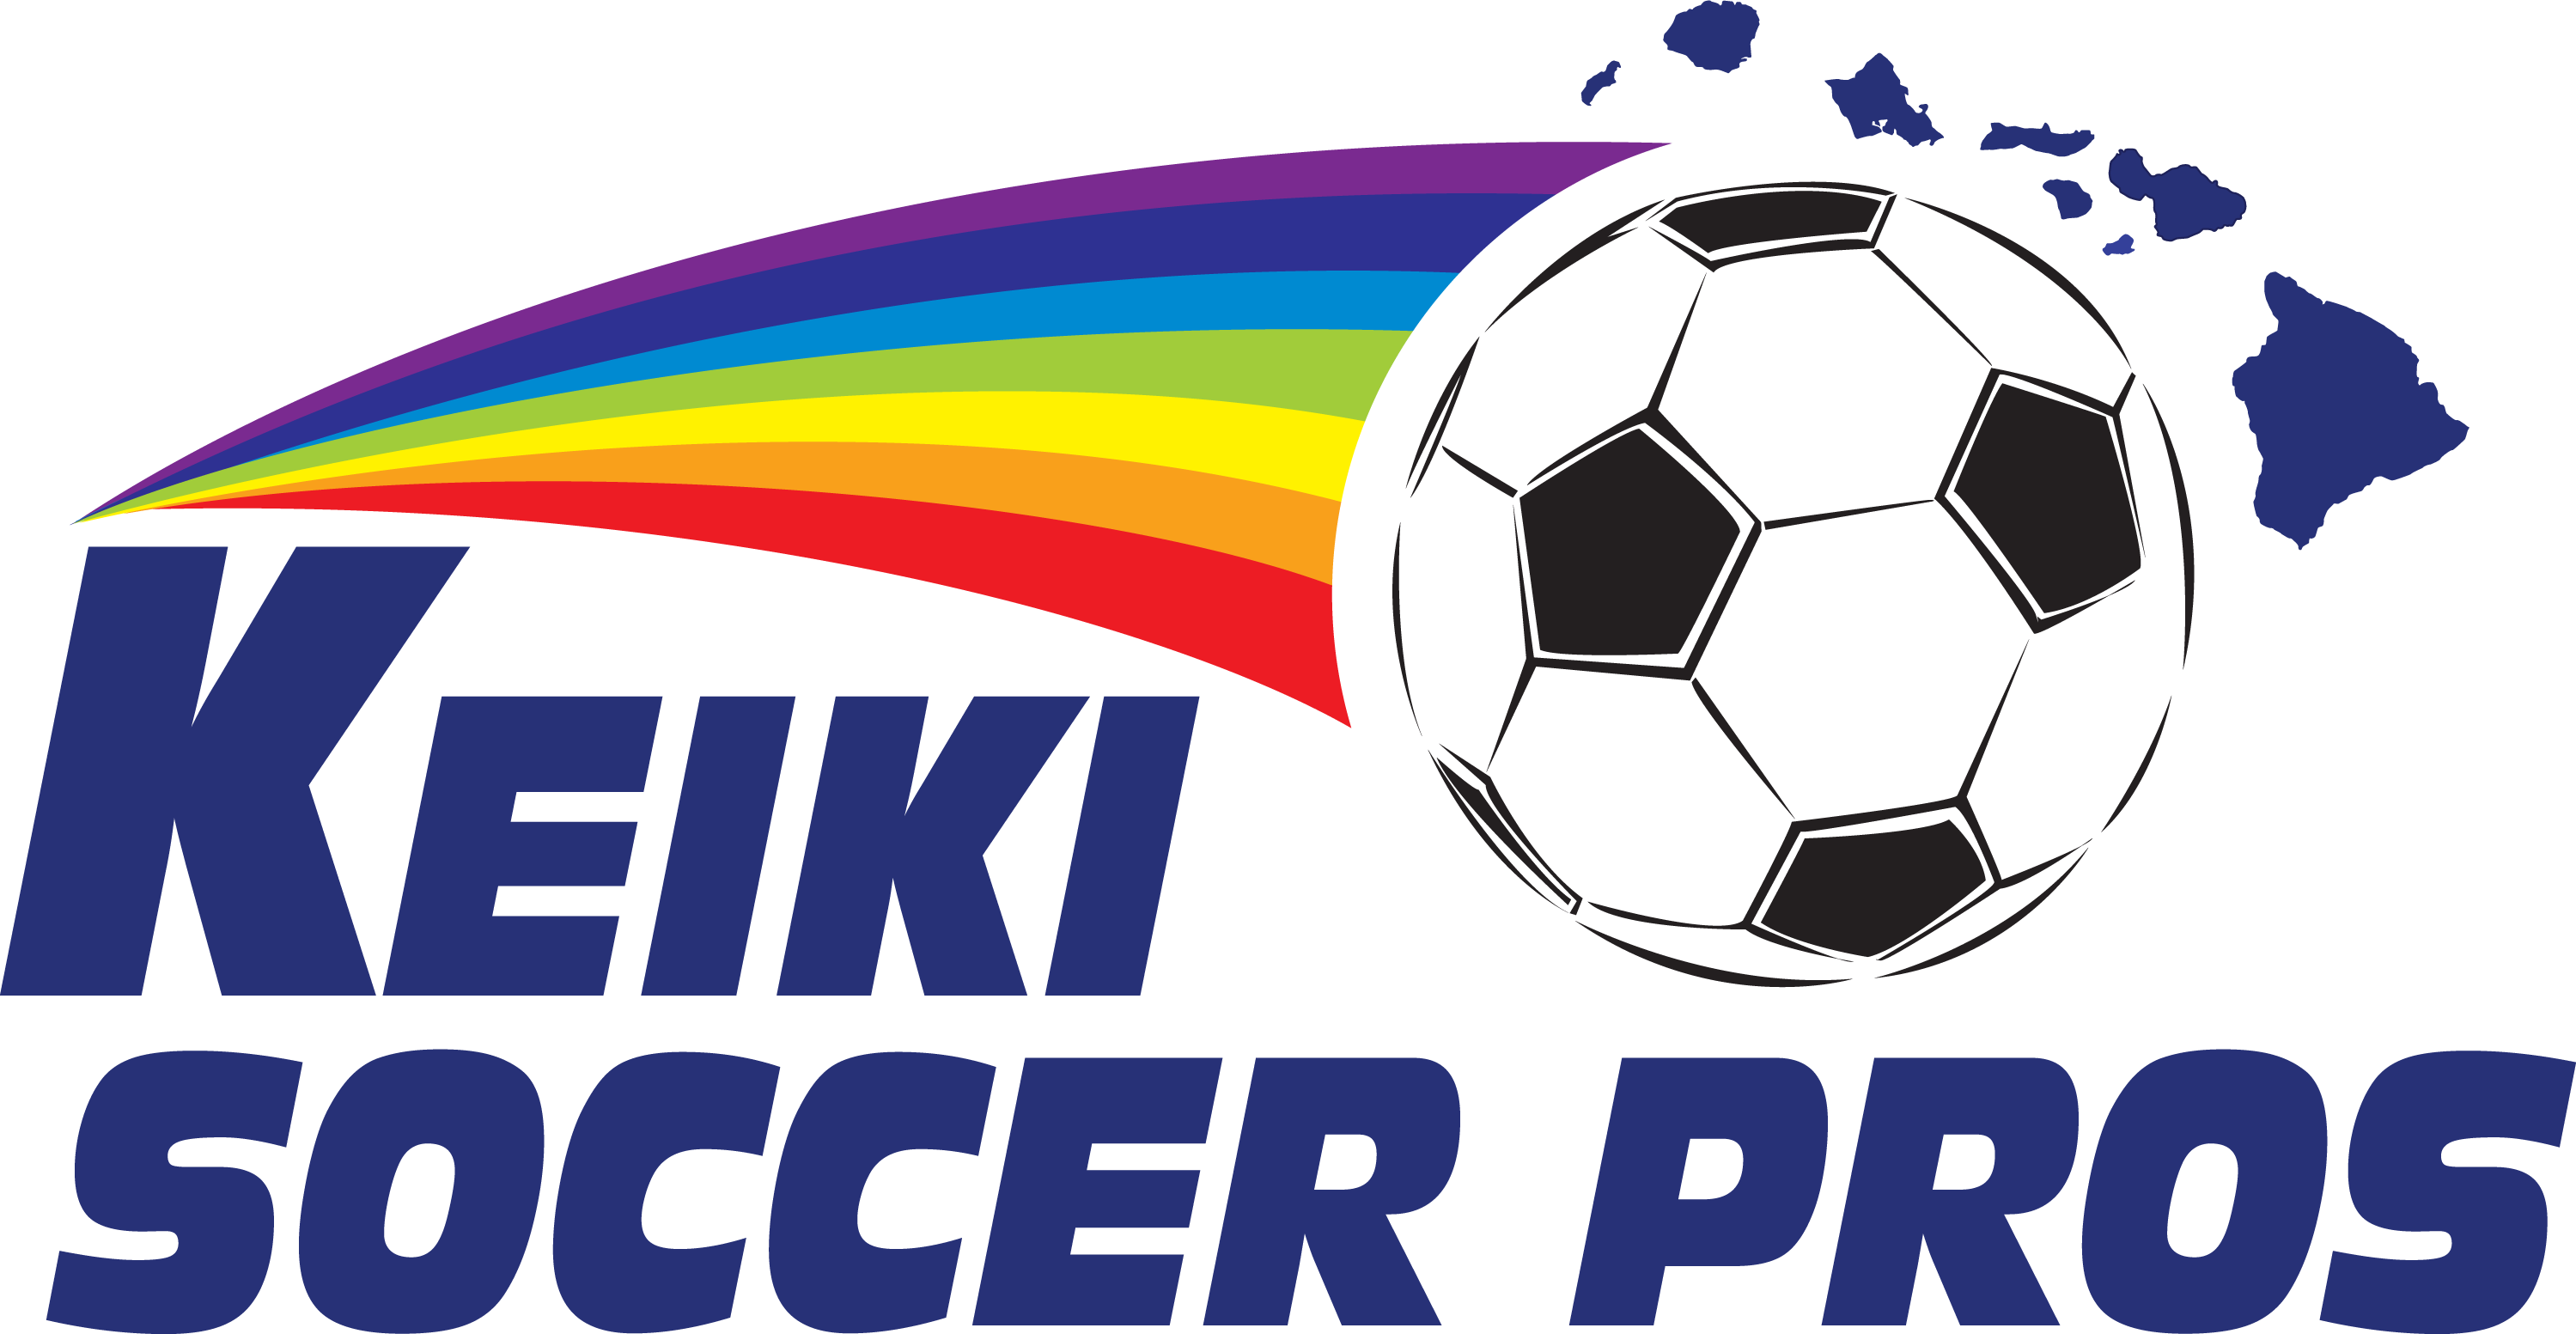 Keiki Soccer